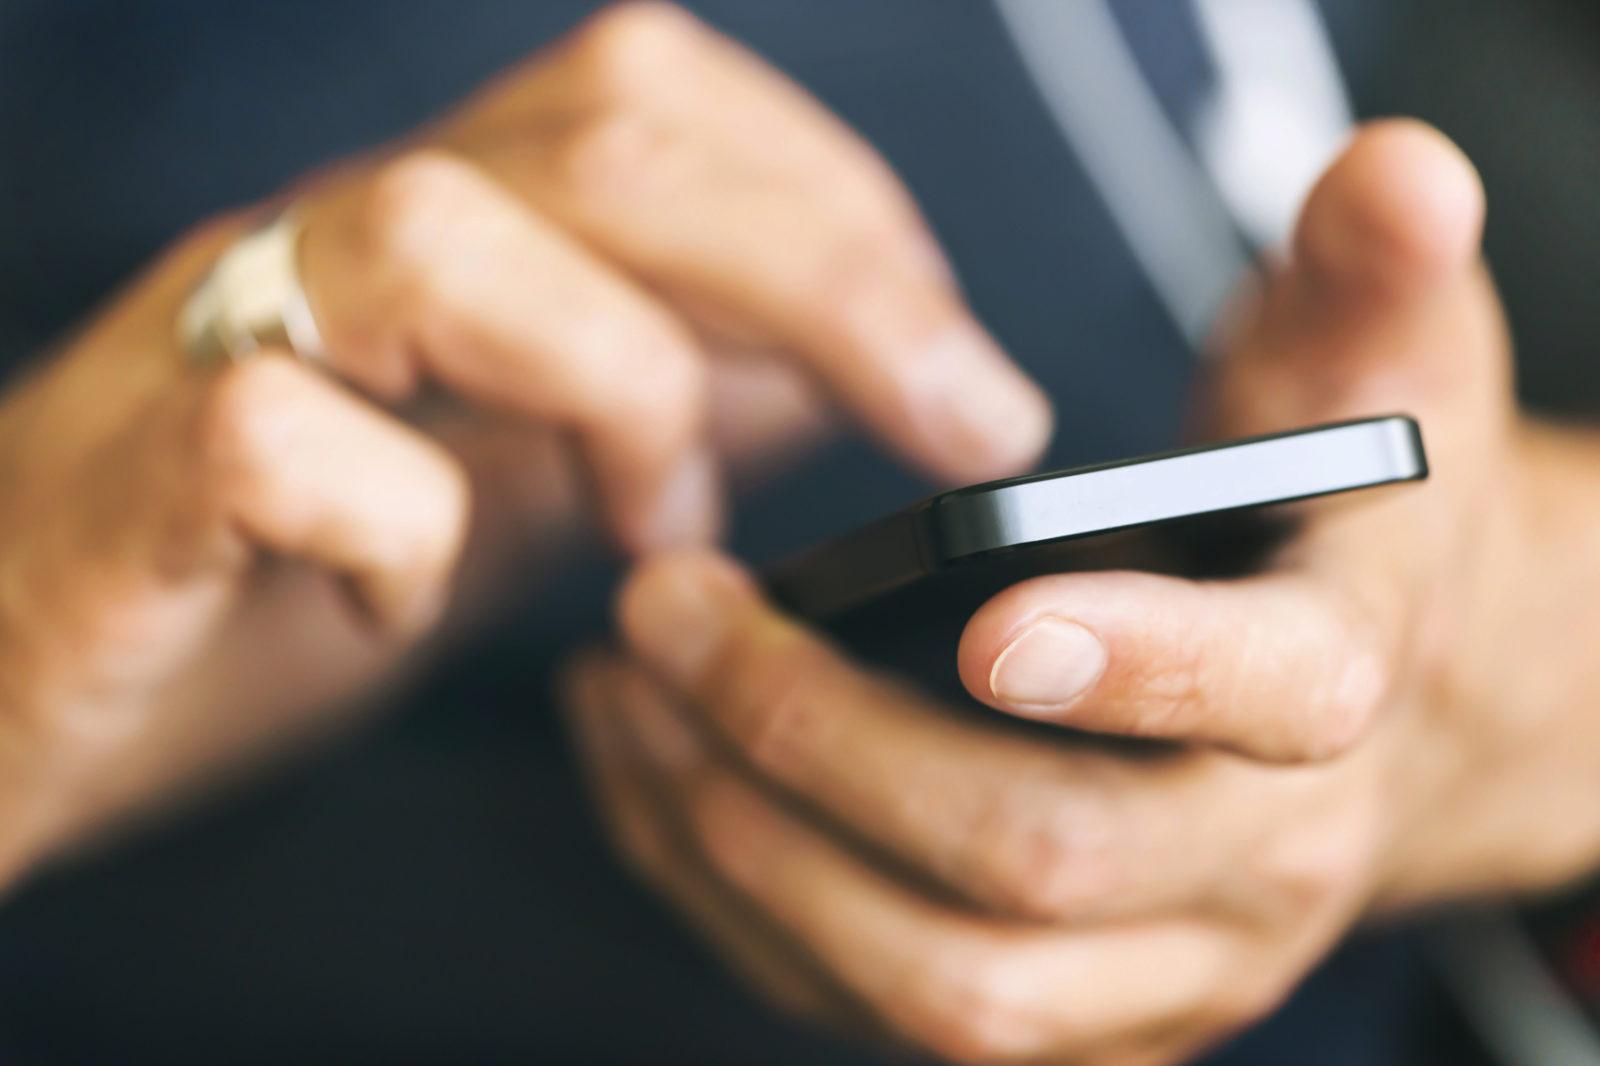 Phone sexting service